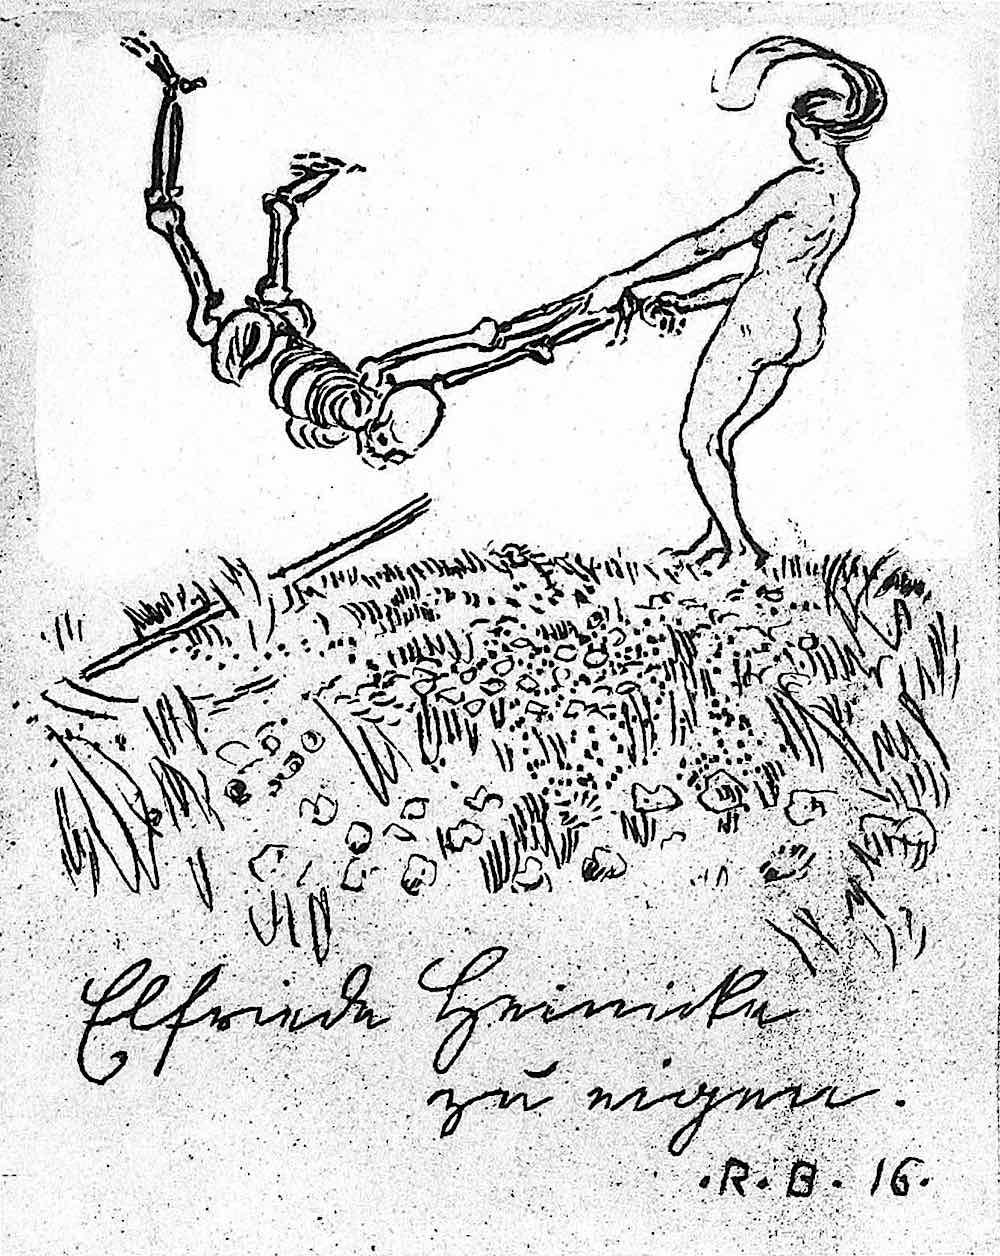 a Robert Budzinski 1916 bookplate of a woman laughing at death